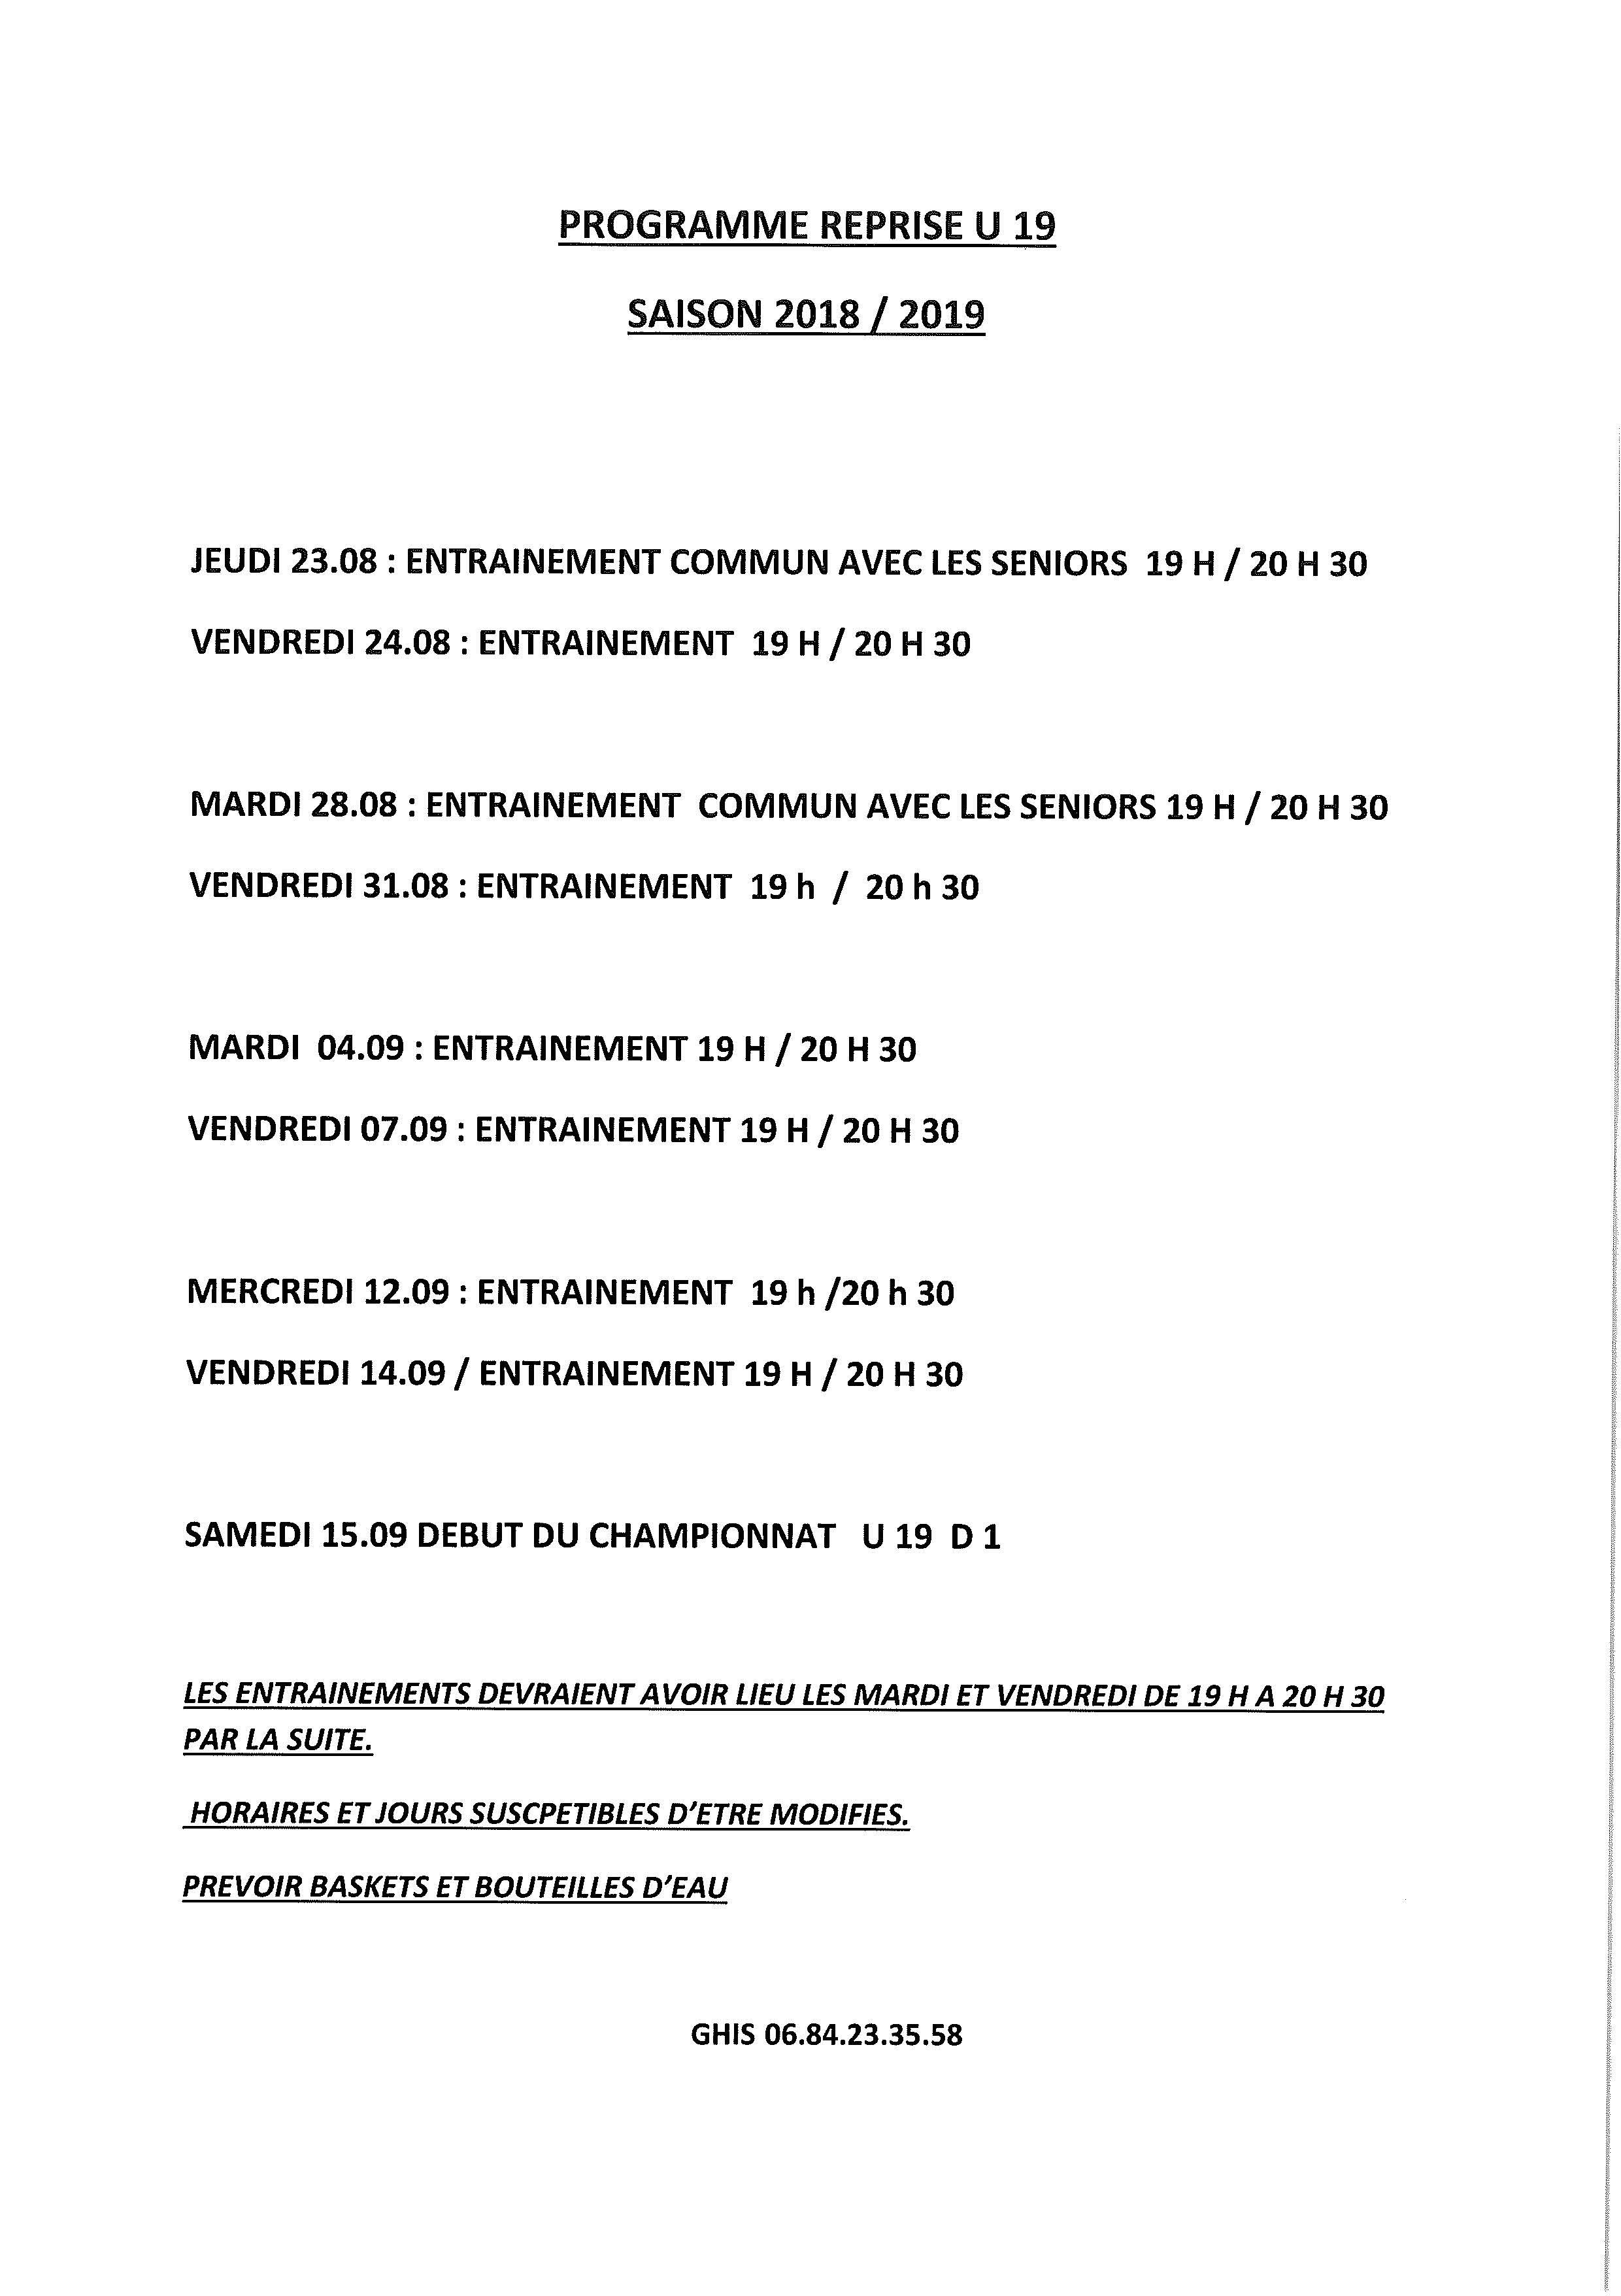 Programme reprise U19